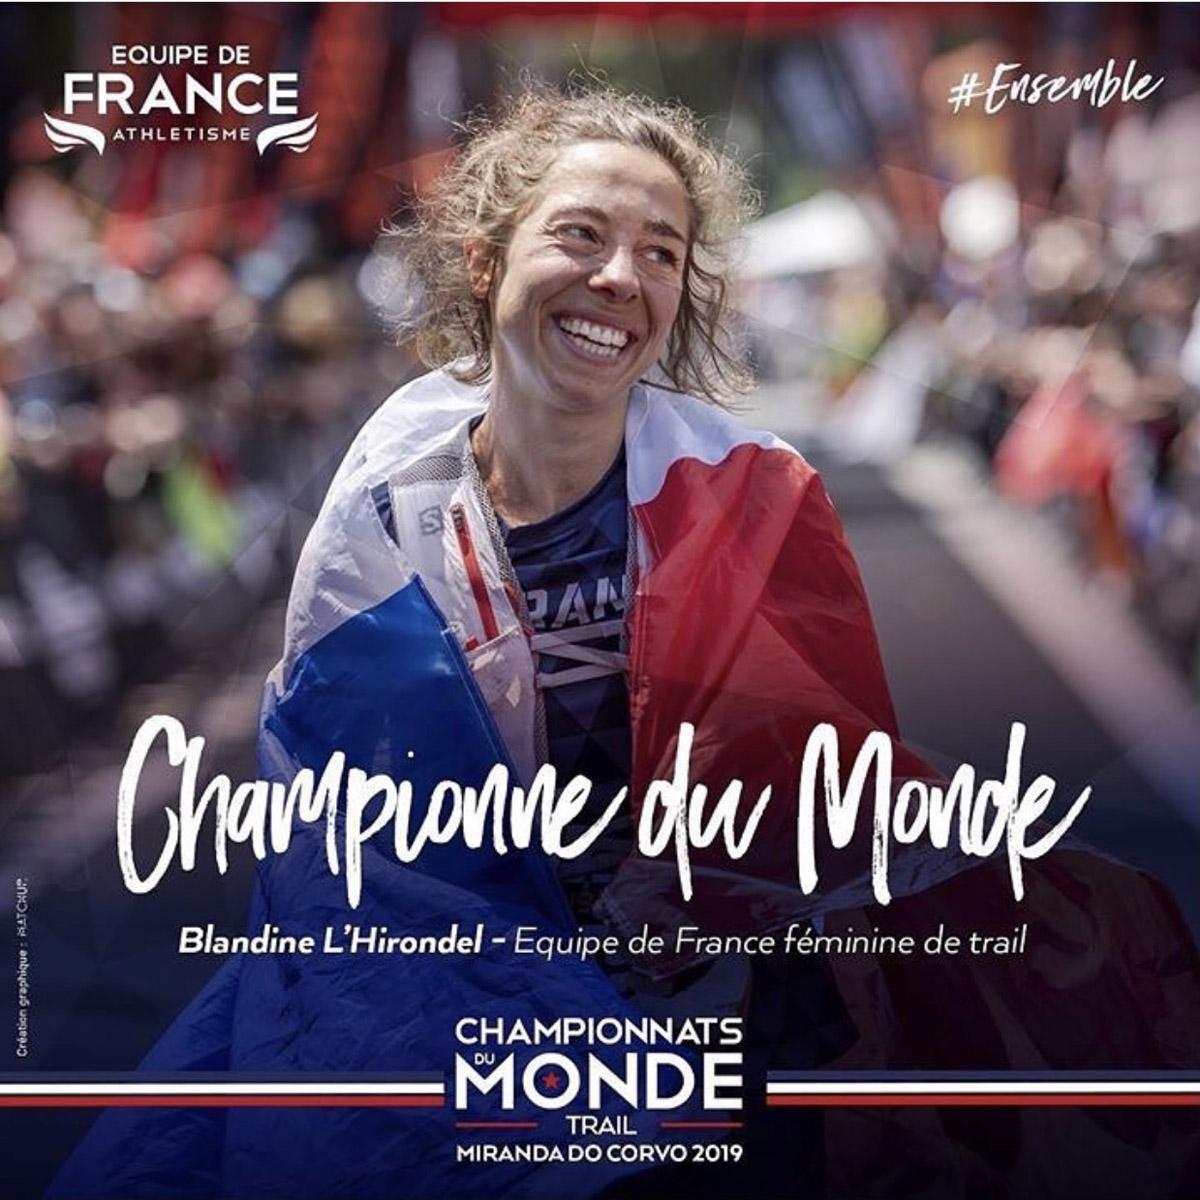 Nouveaux athlètes français chez Hoka One One®